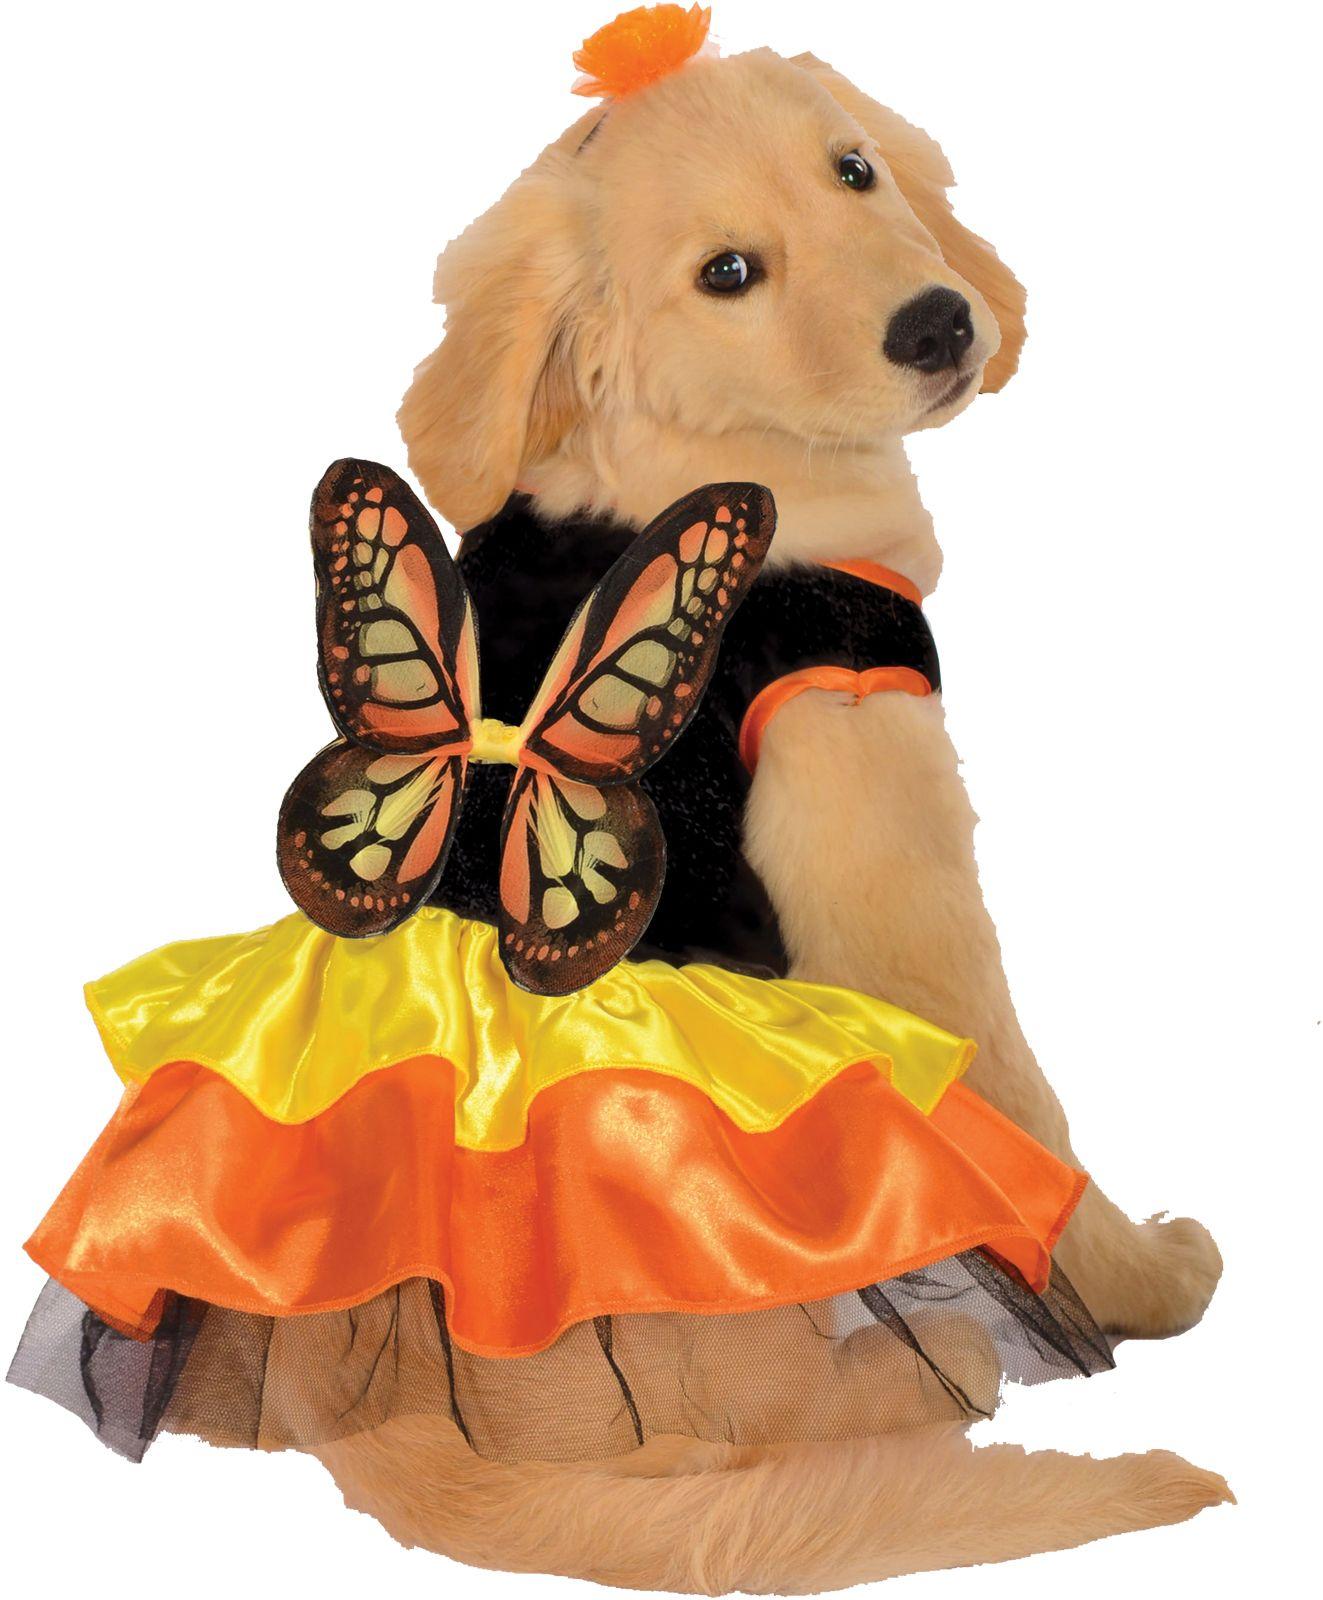 23 Medium Dog Halloween Costumes Pet Costumes For Dogs Dog